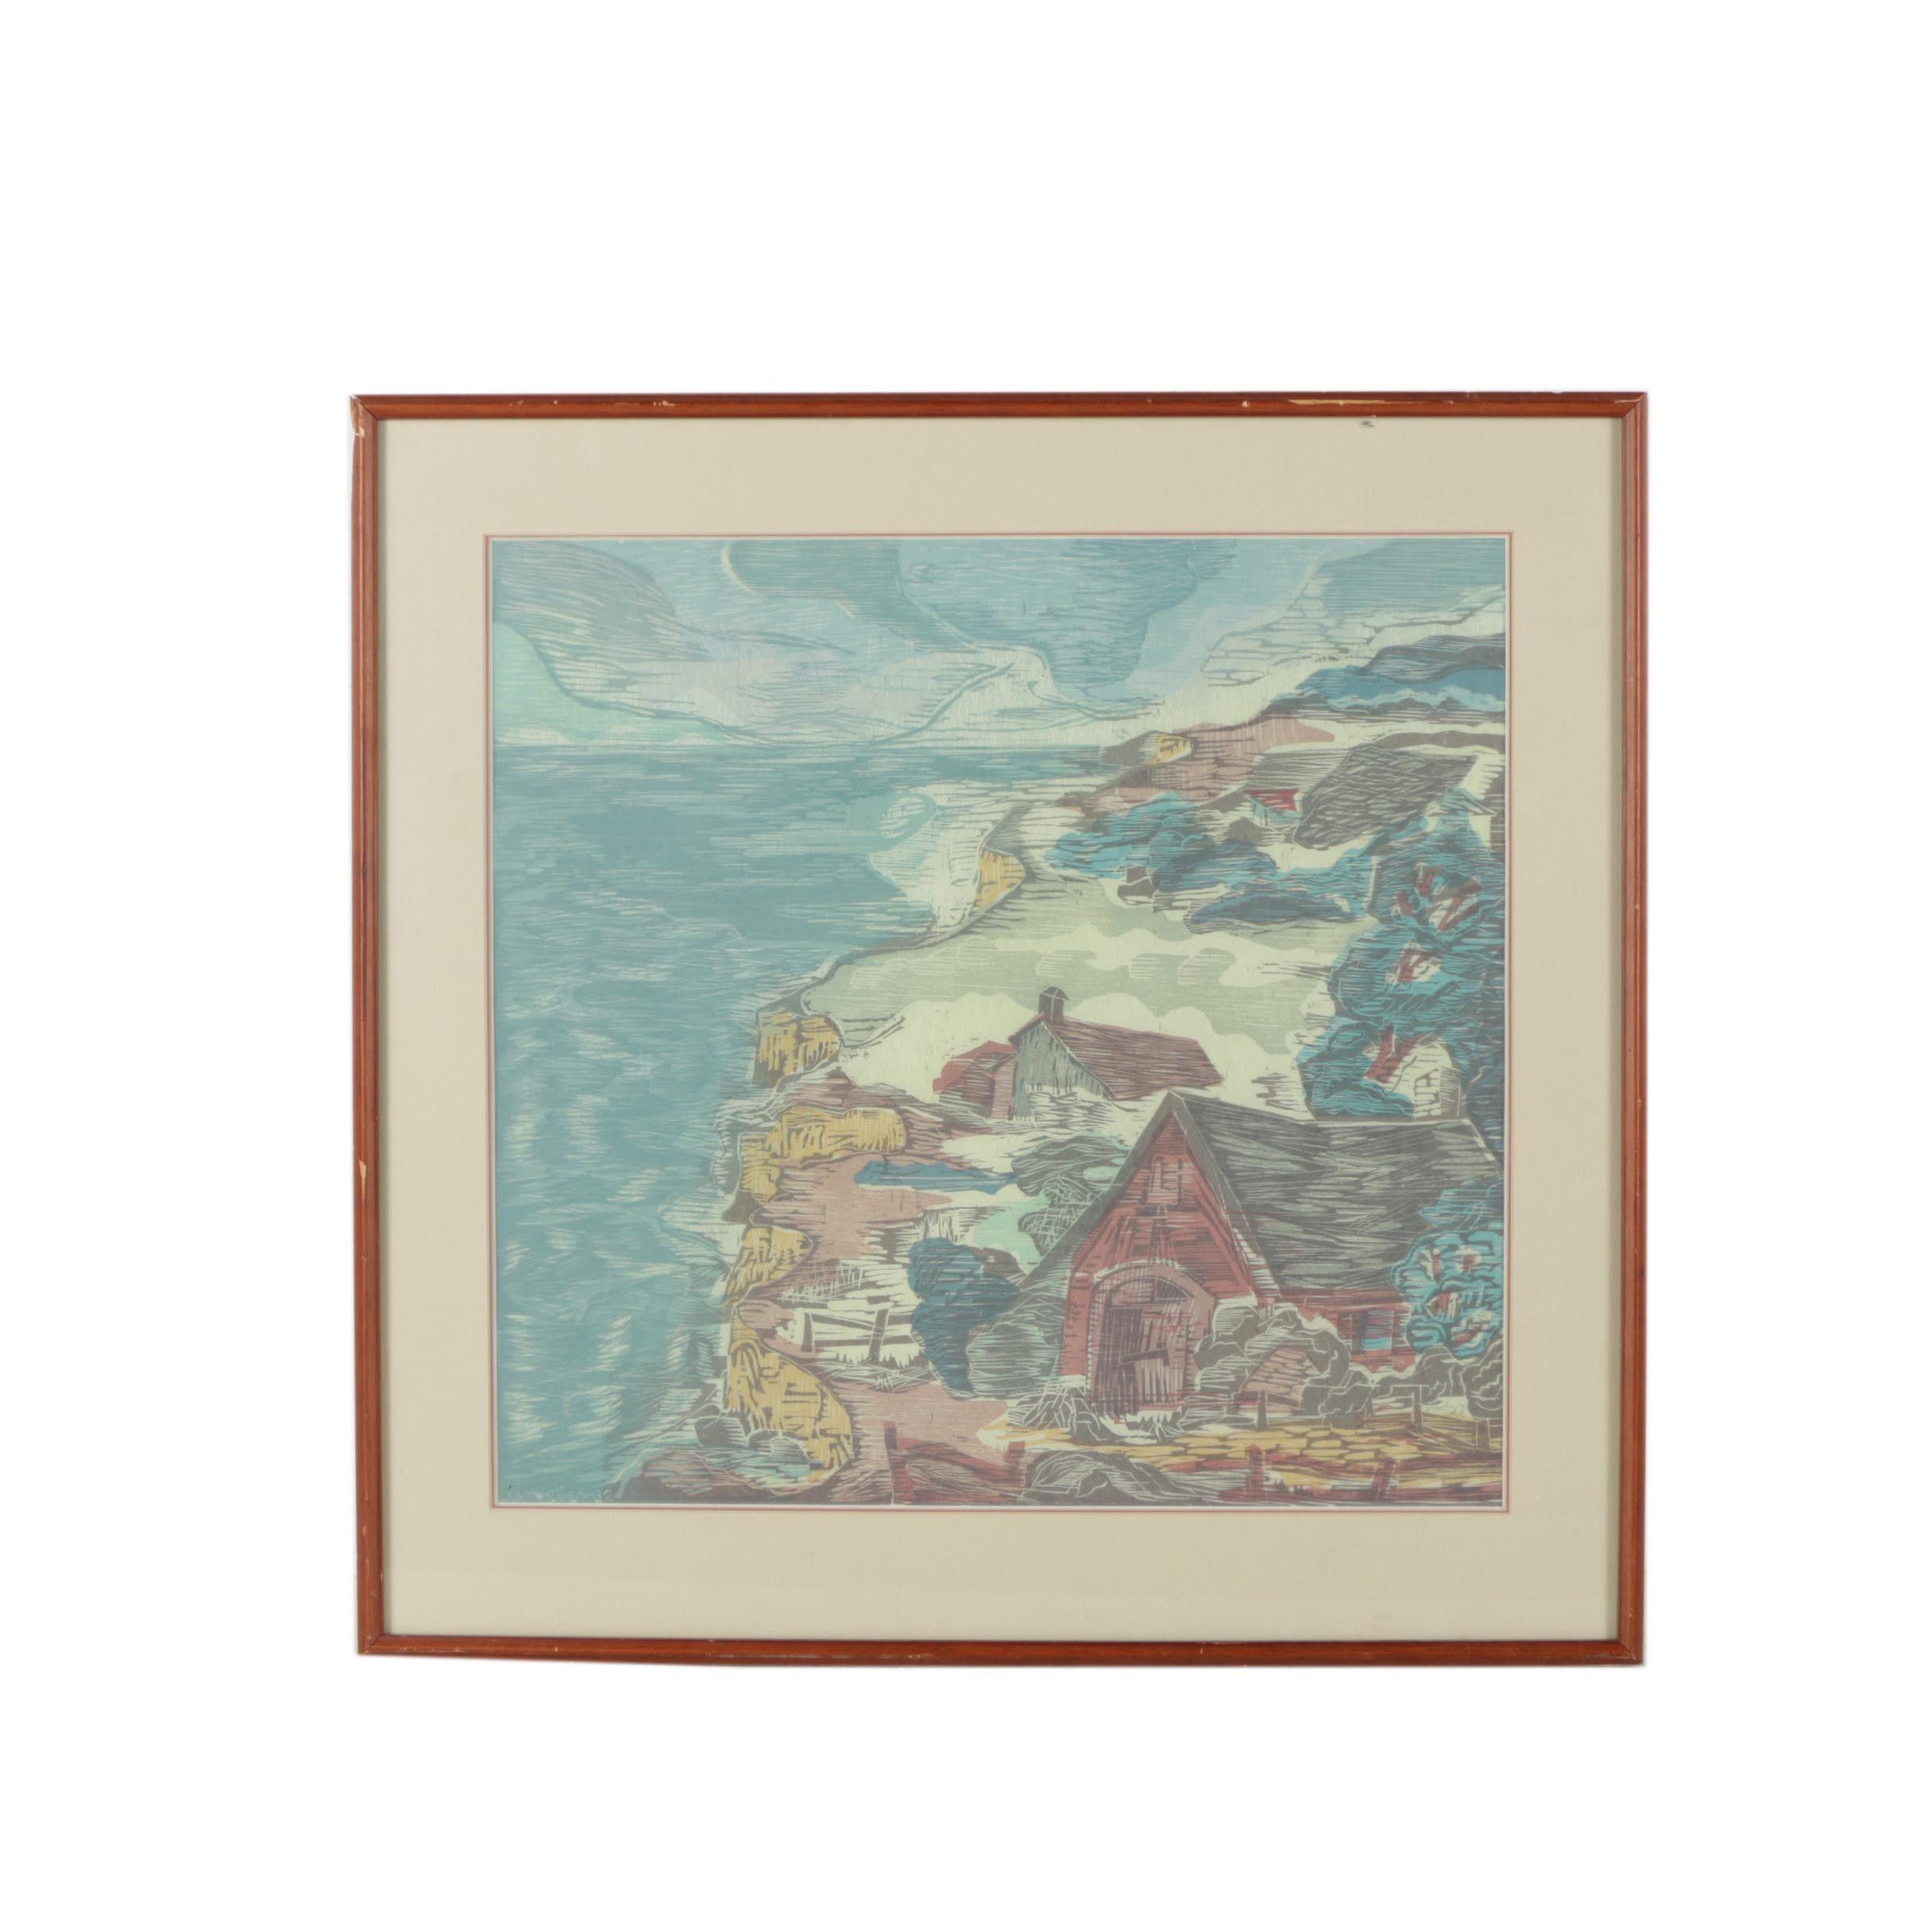 Bernard Kroeber 1982 Relief Print of Seaside Landscape